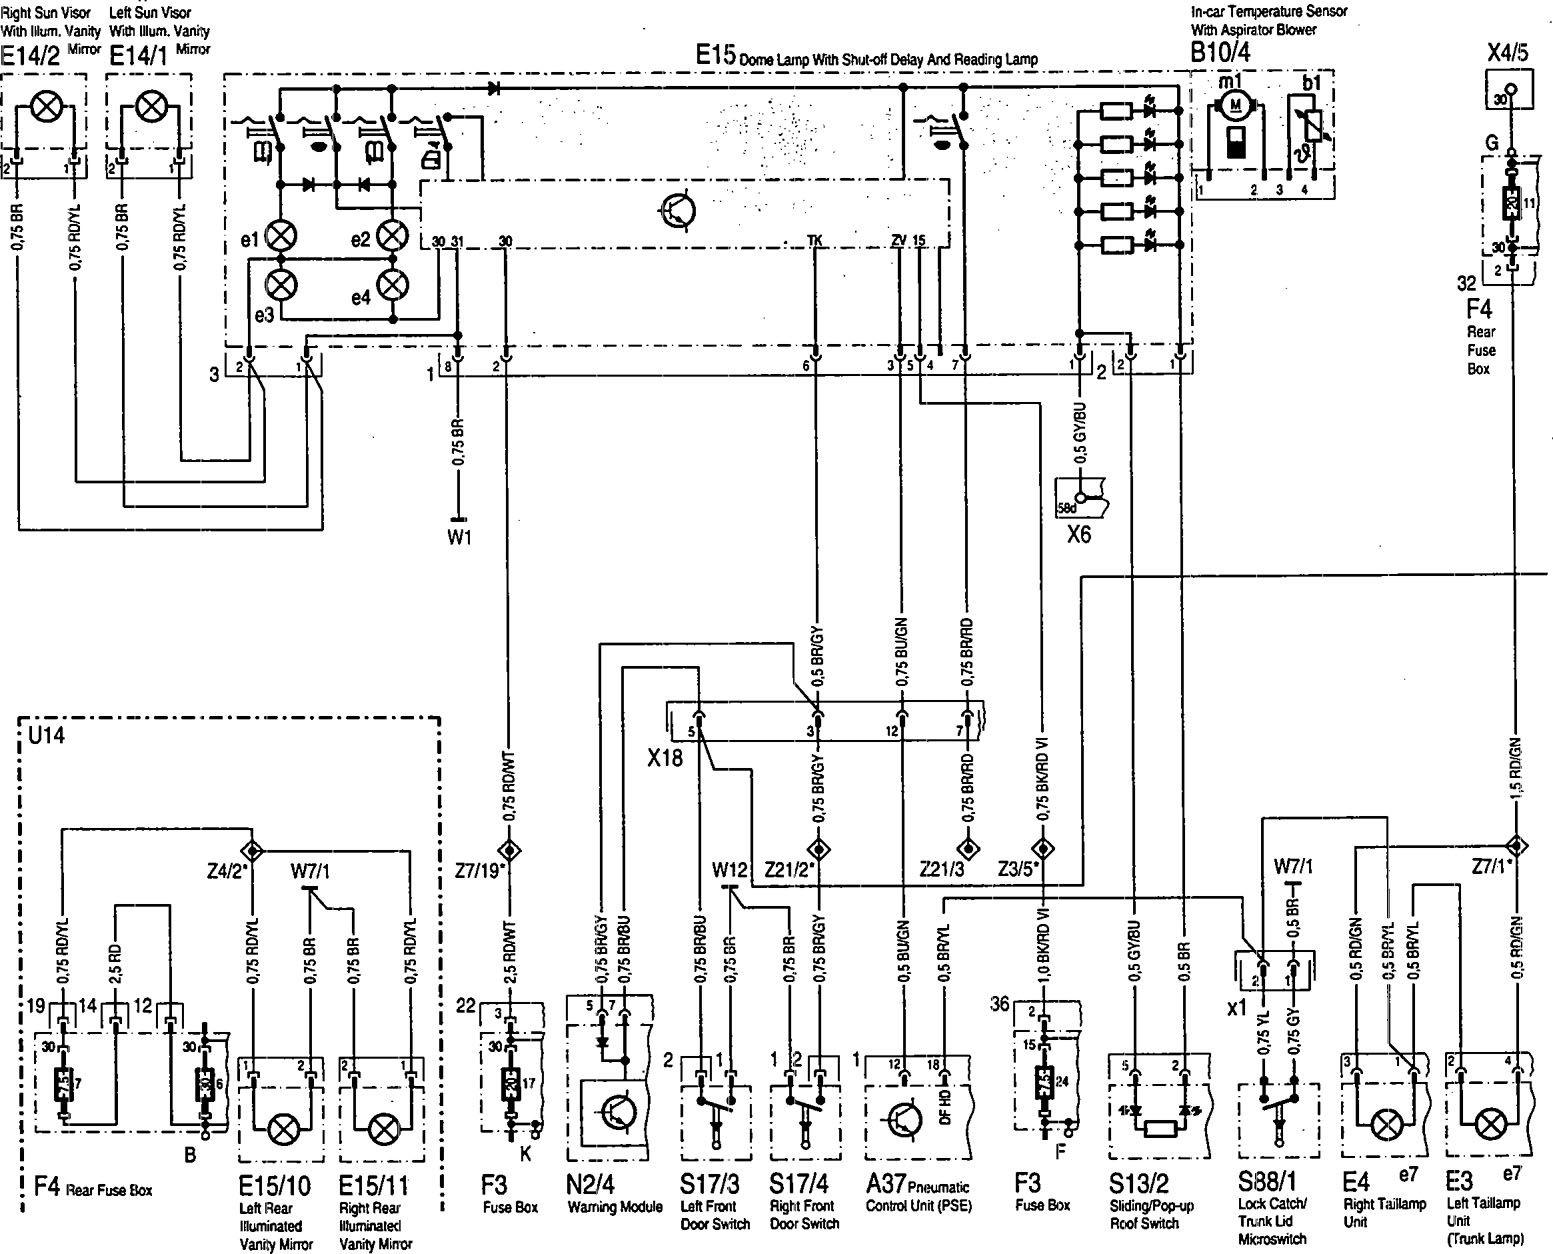 mercedes-benz 300sd  1992 - 1993